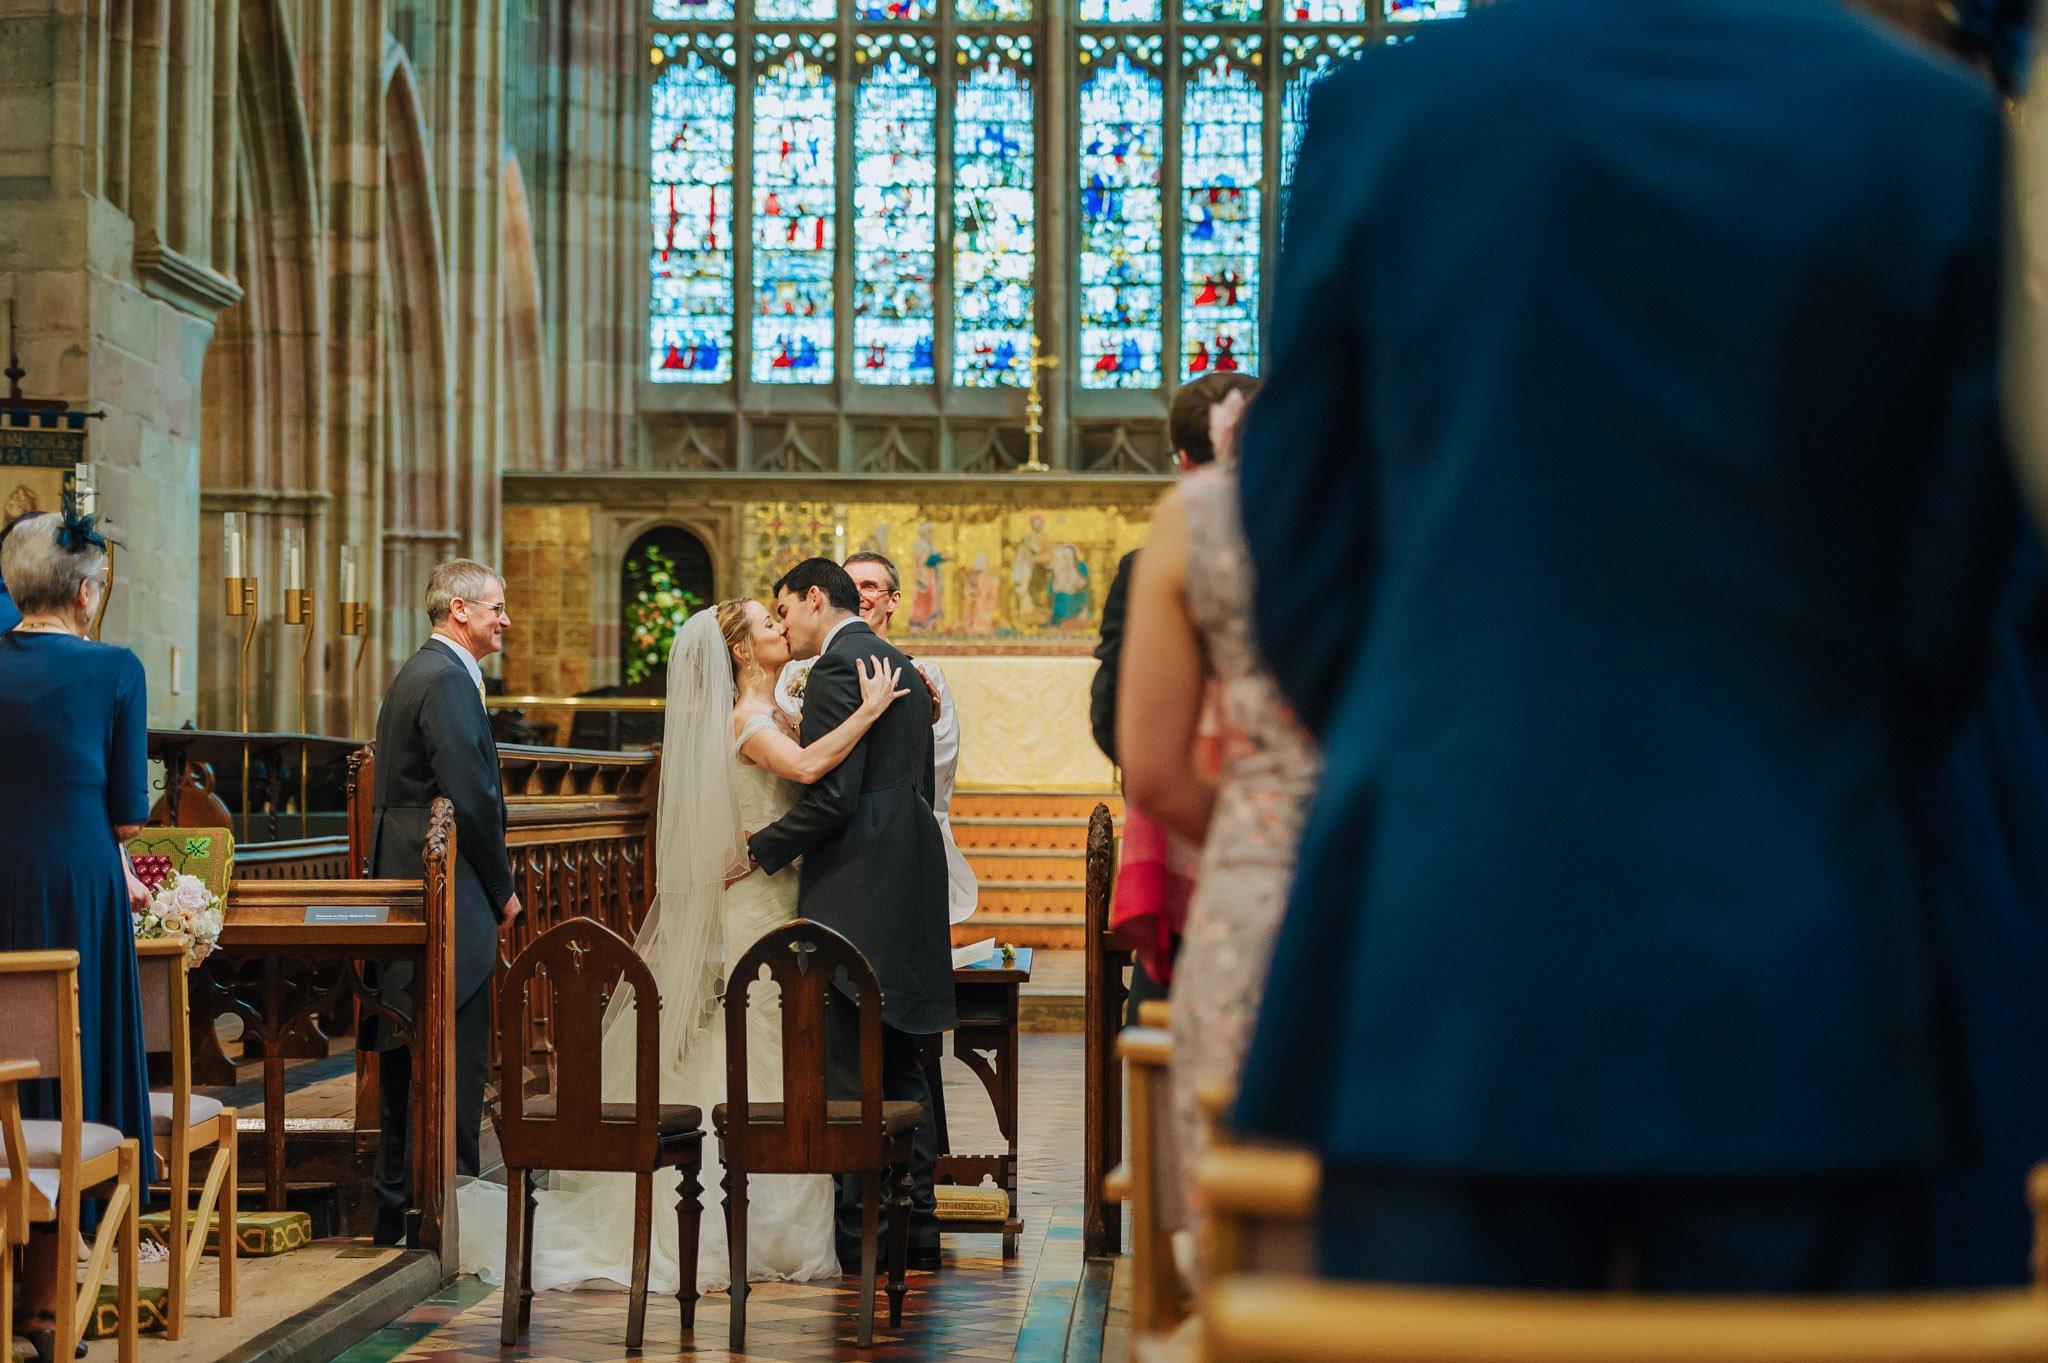 Georgina + Mike - Wedding photography in Malvern, Worcestershire 29